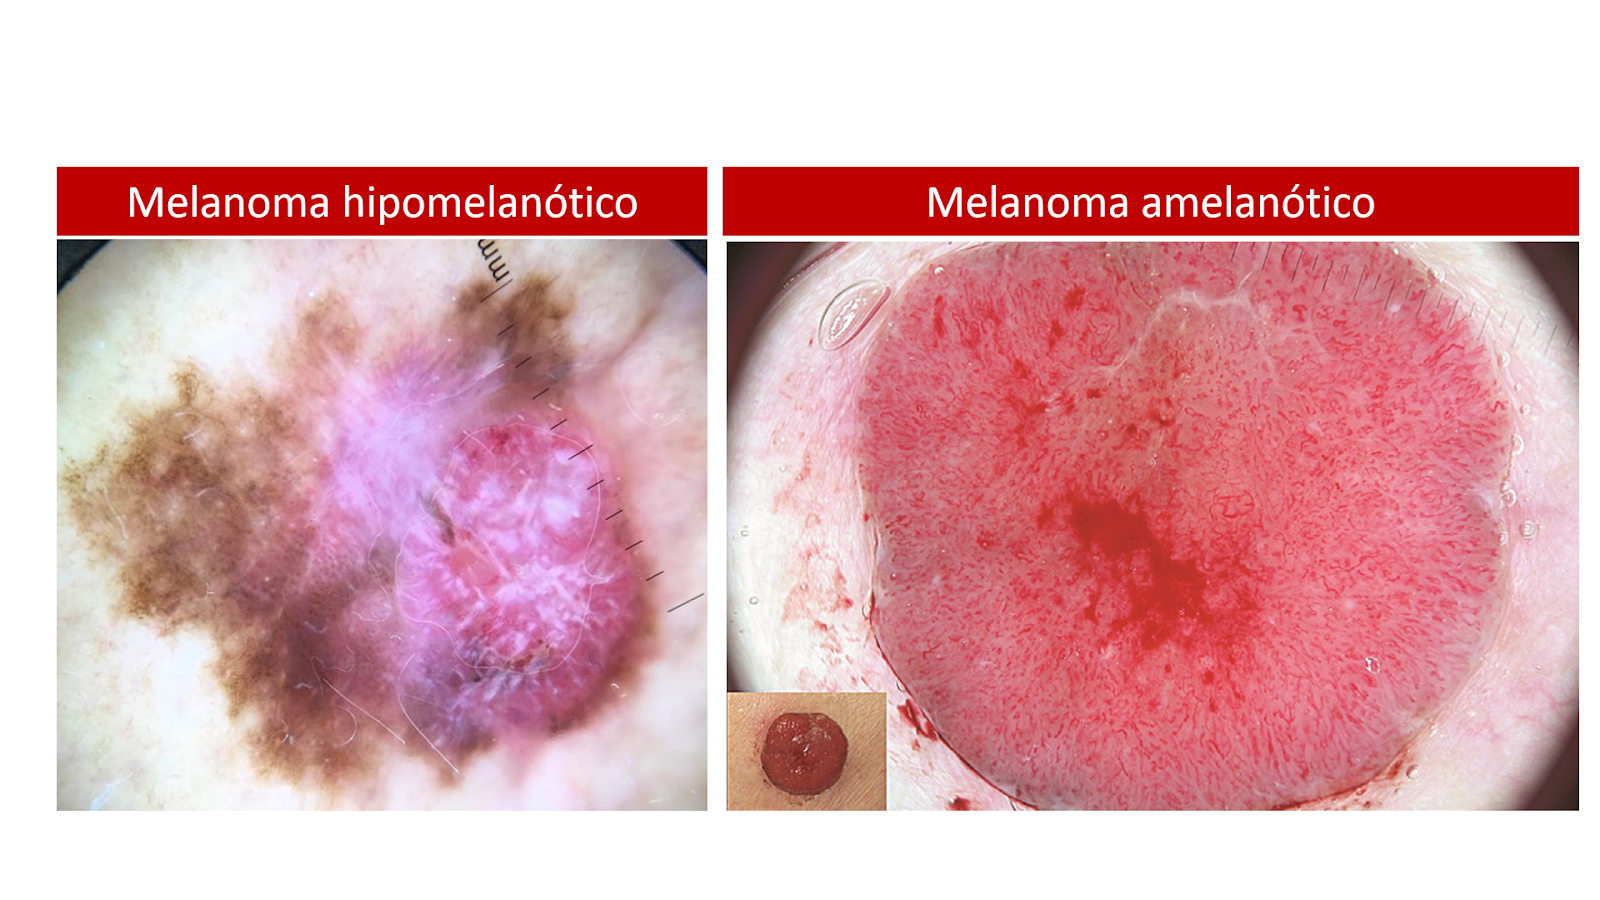 Melanoma con vasos puntiformes